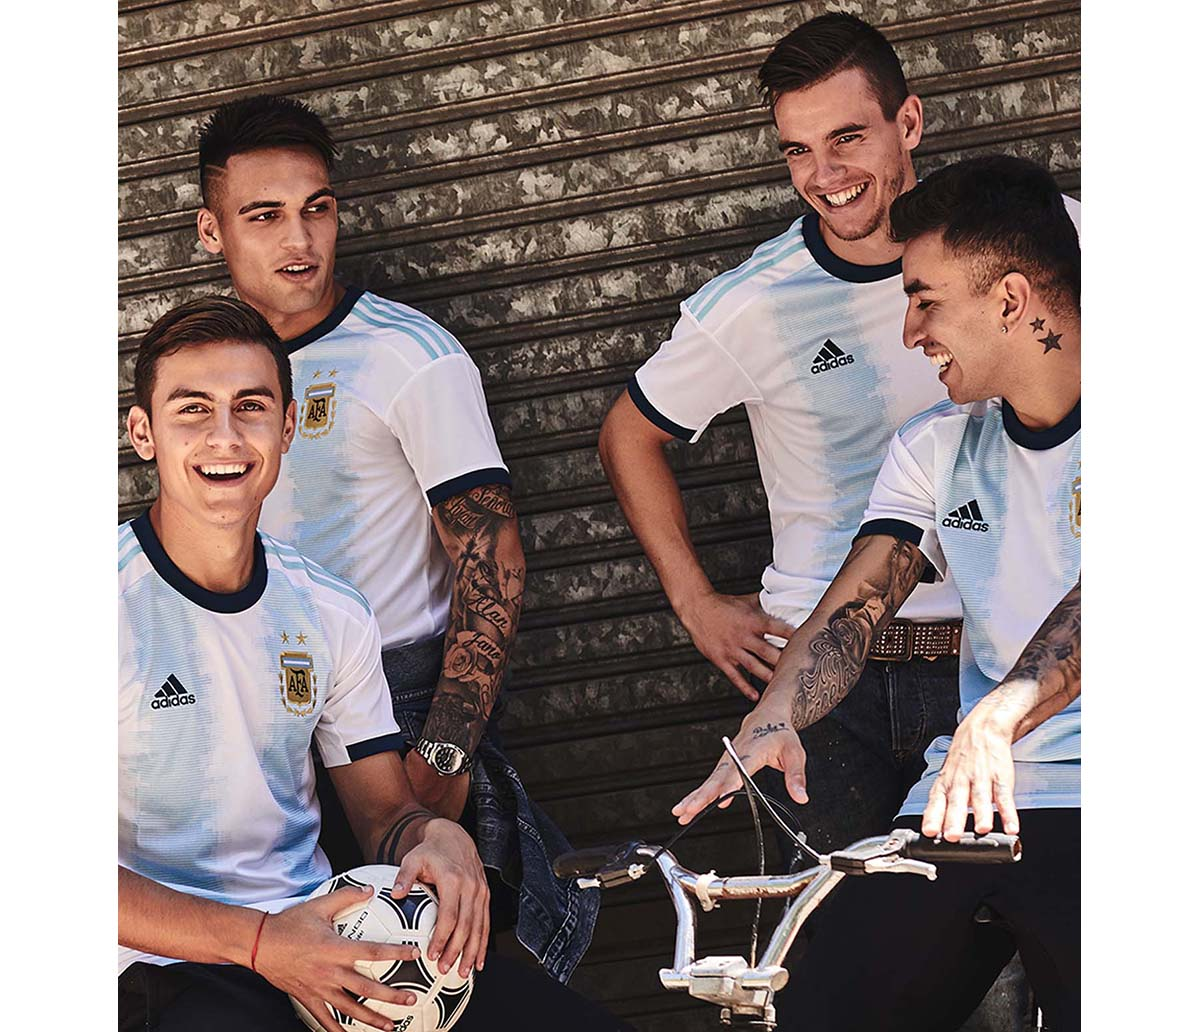 argentina-home-2019-copa-america-2-2